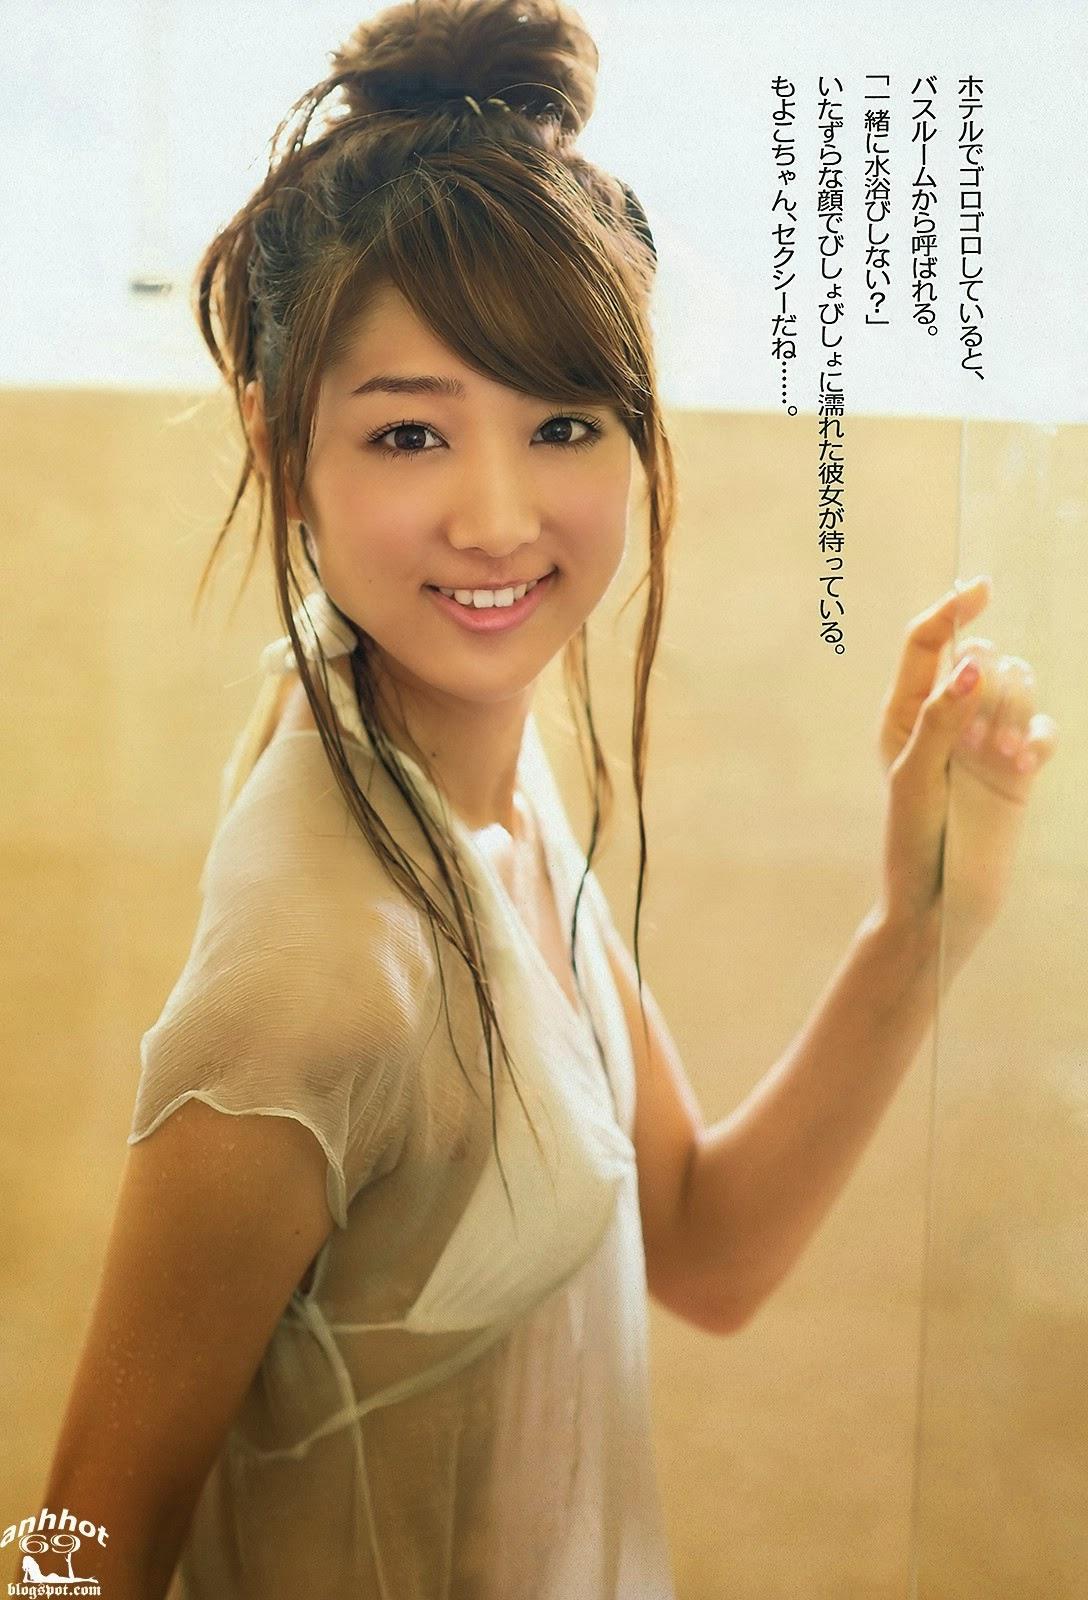 moyoko-sasaki-02095651